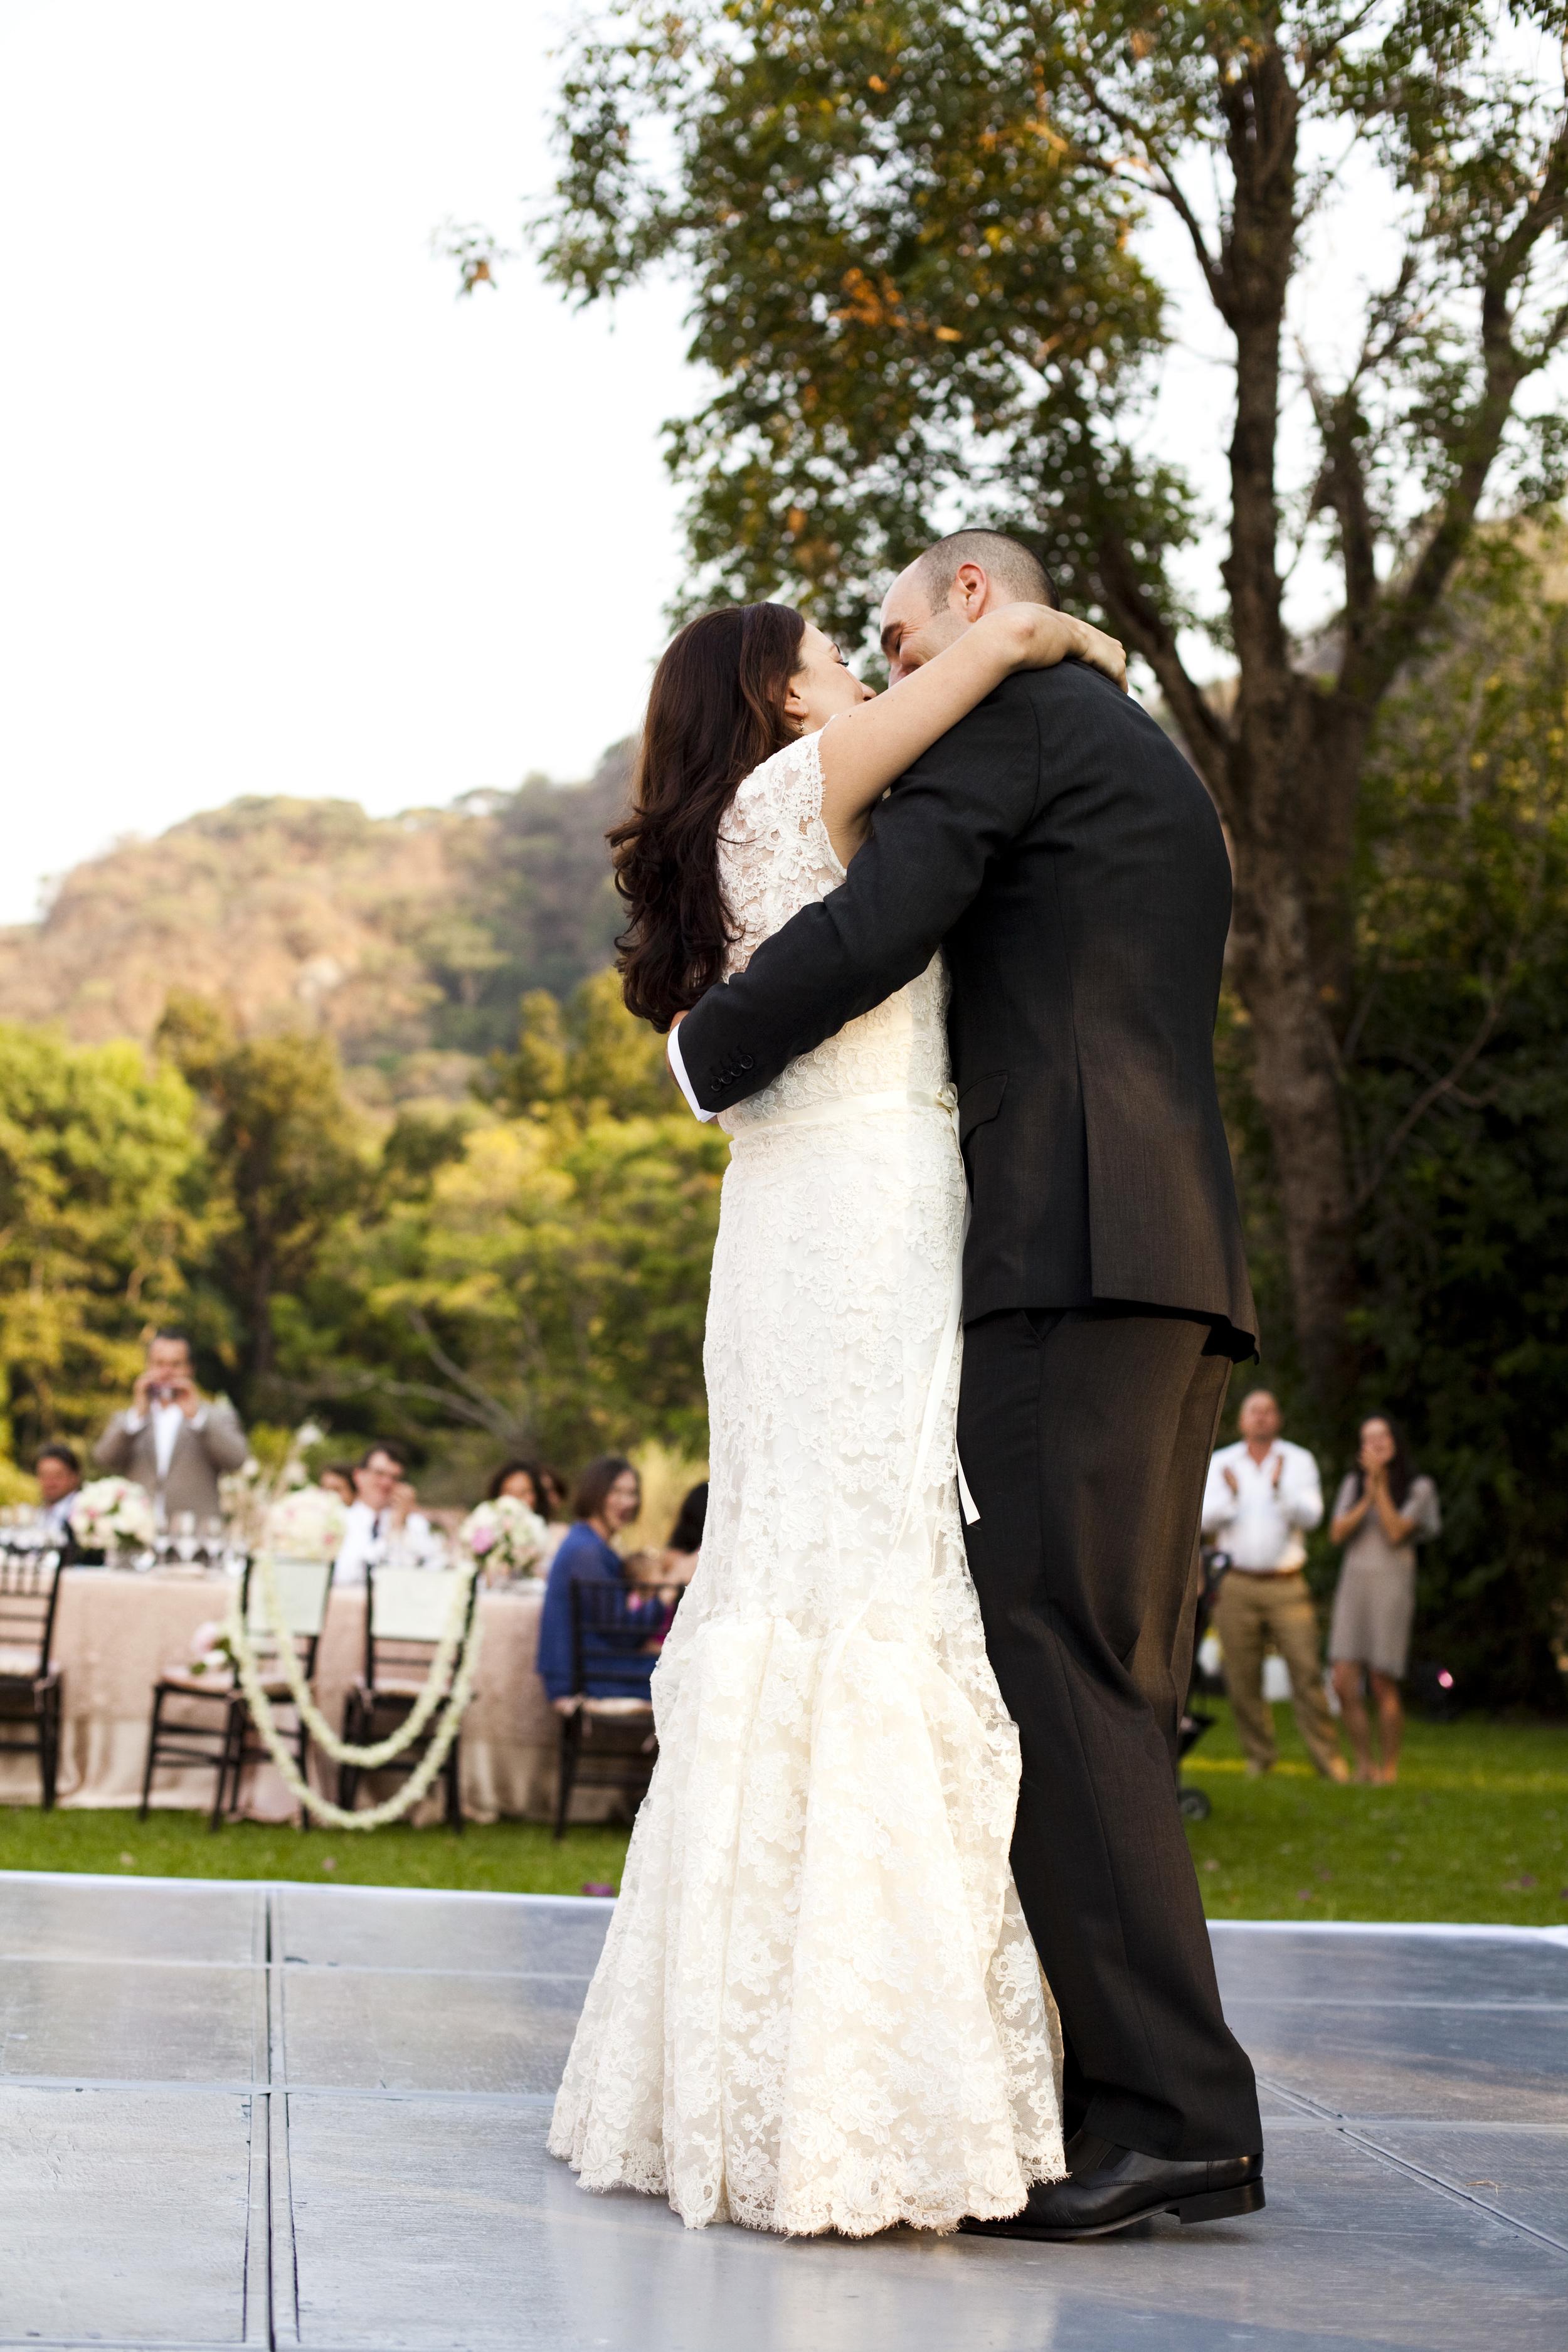 Ceci_New_York_Style_Luxury_Custom_Mexico_Wedding_CeciBride_Letterpress_NewYork_Foil_Hacienda_de_San_Antonio_46.jpg